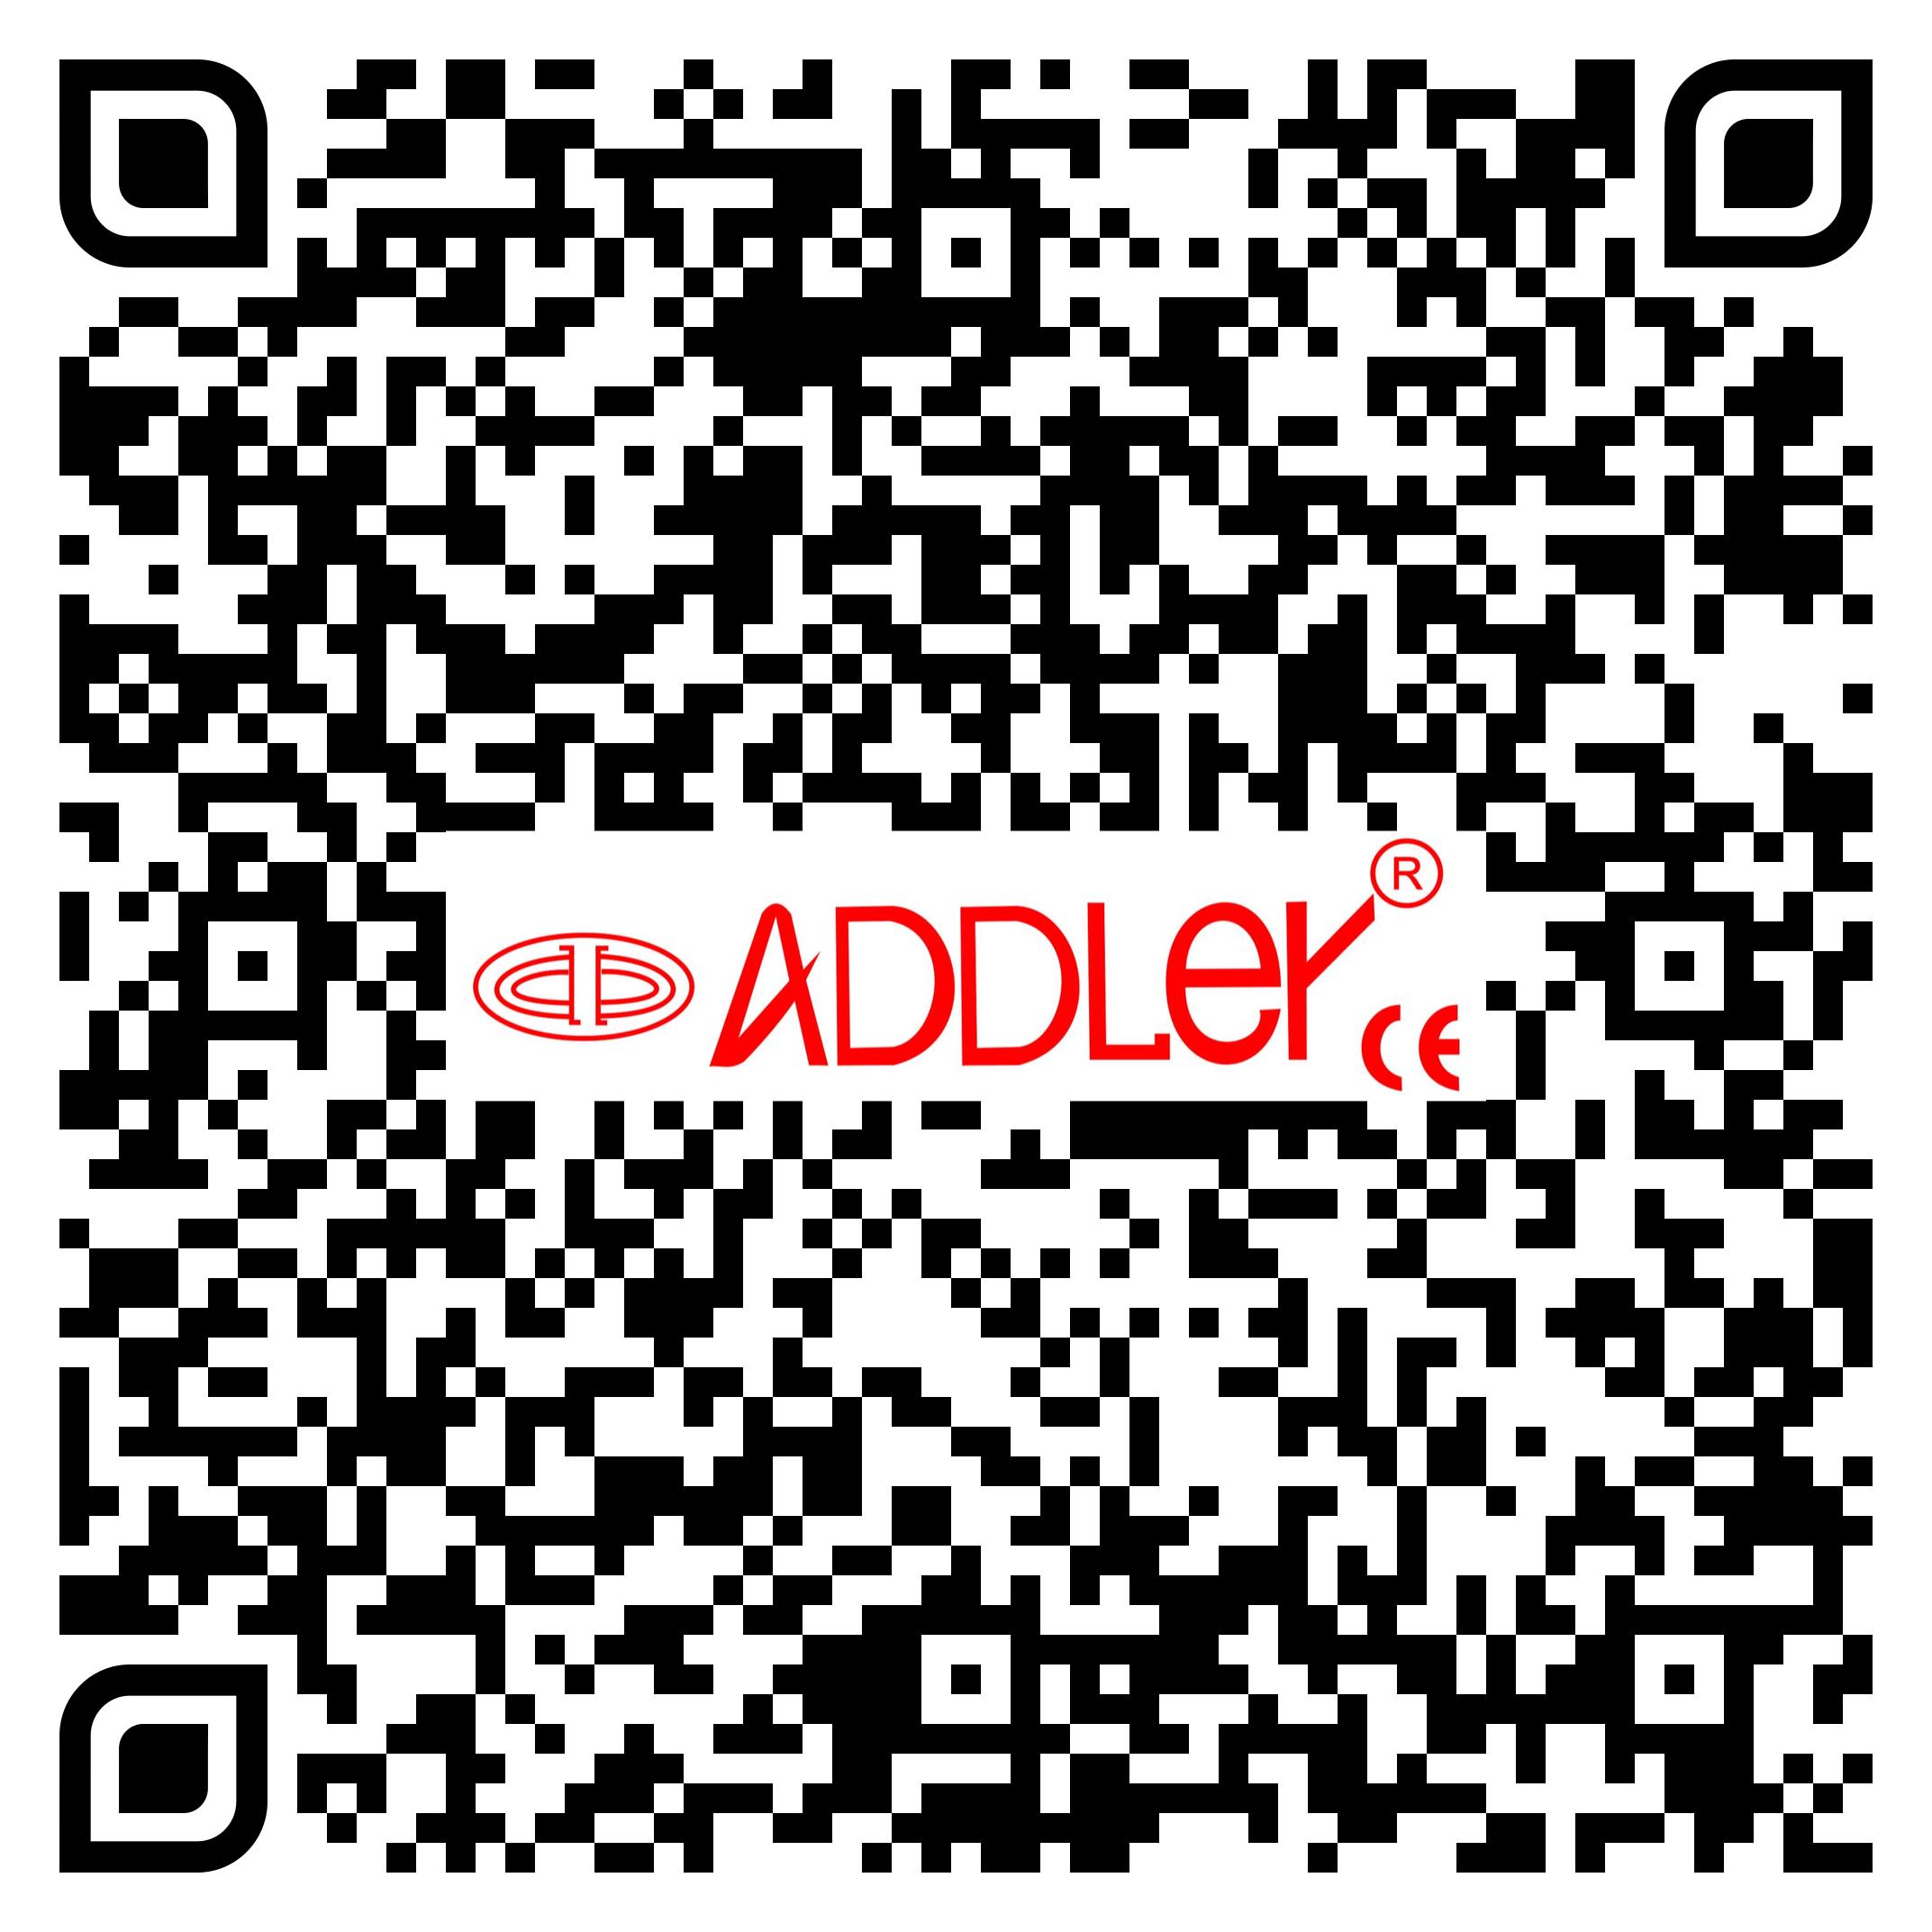 Brand New ADDLER Laparoscopic Grasper Set of 3 with Monopolar HookBrand New Addler Laparoscopic Grasper Set Of 3 With Monopolar Hook